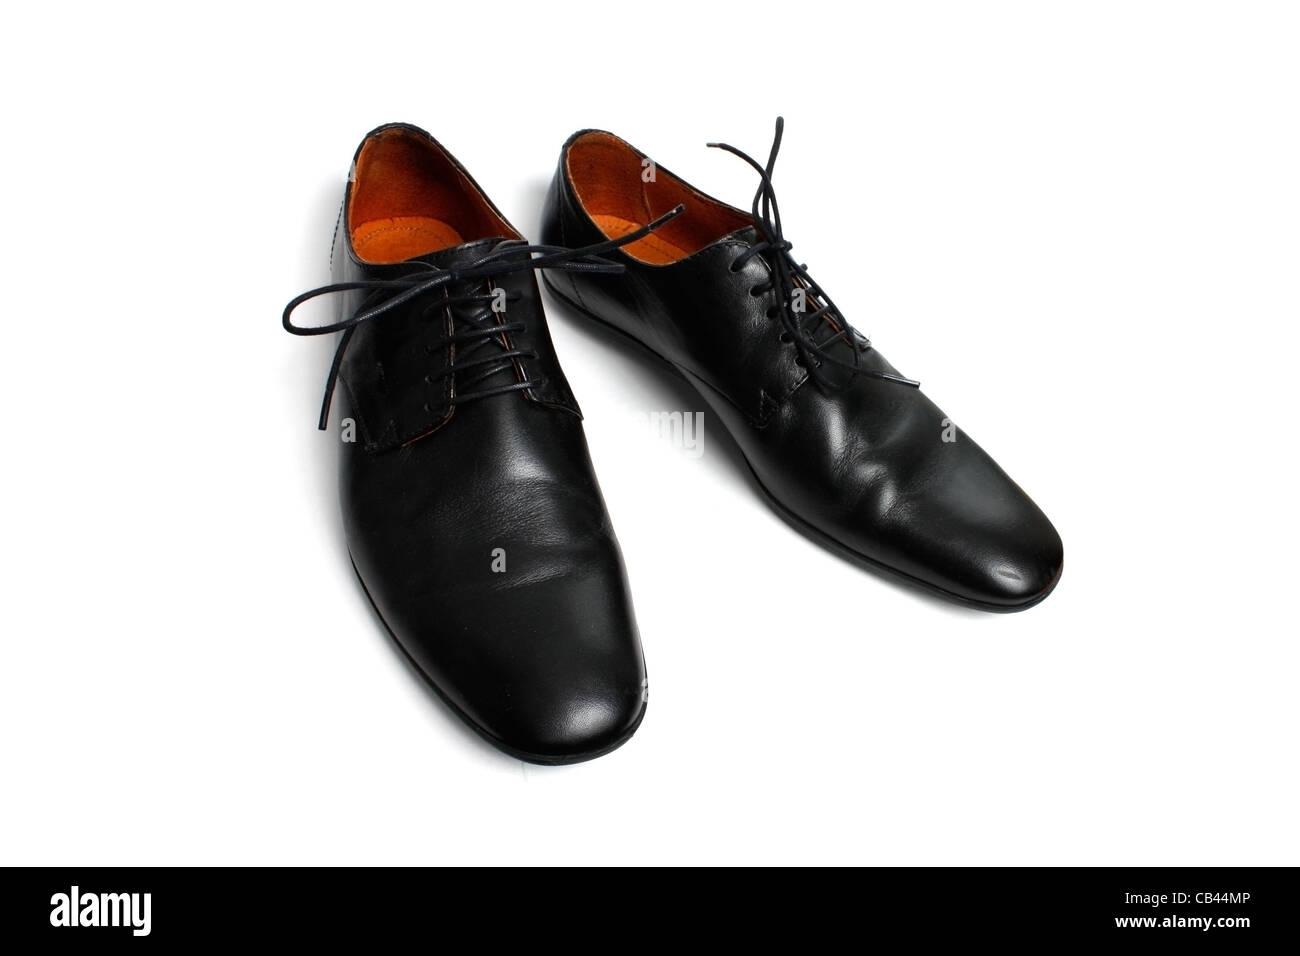 Black shoes isolated on white - Stock Image